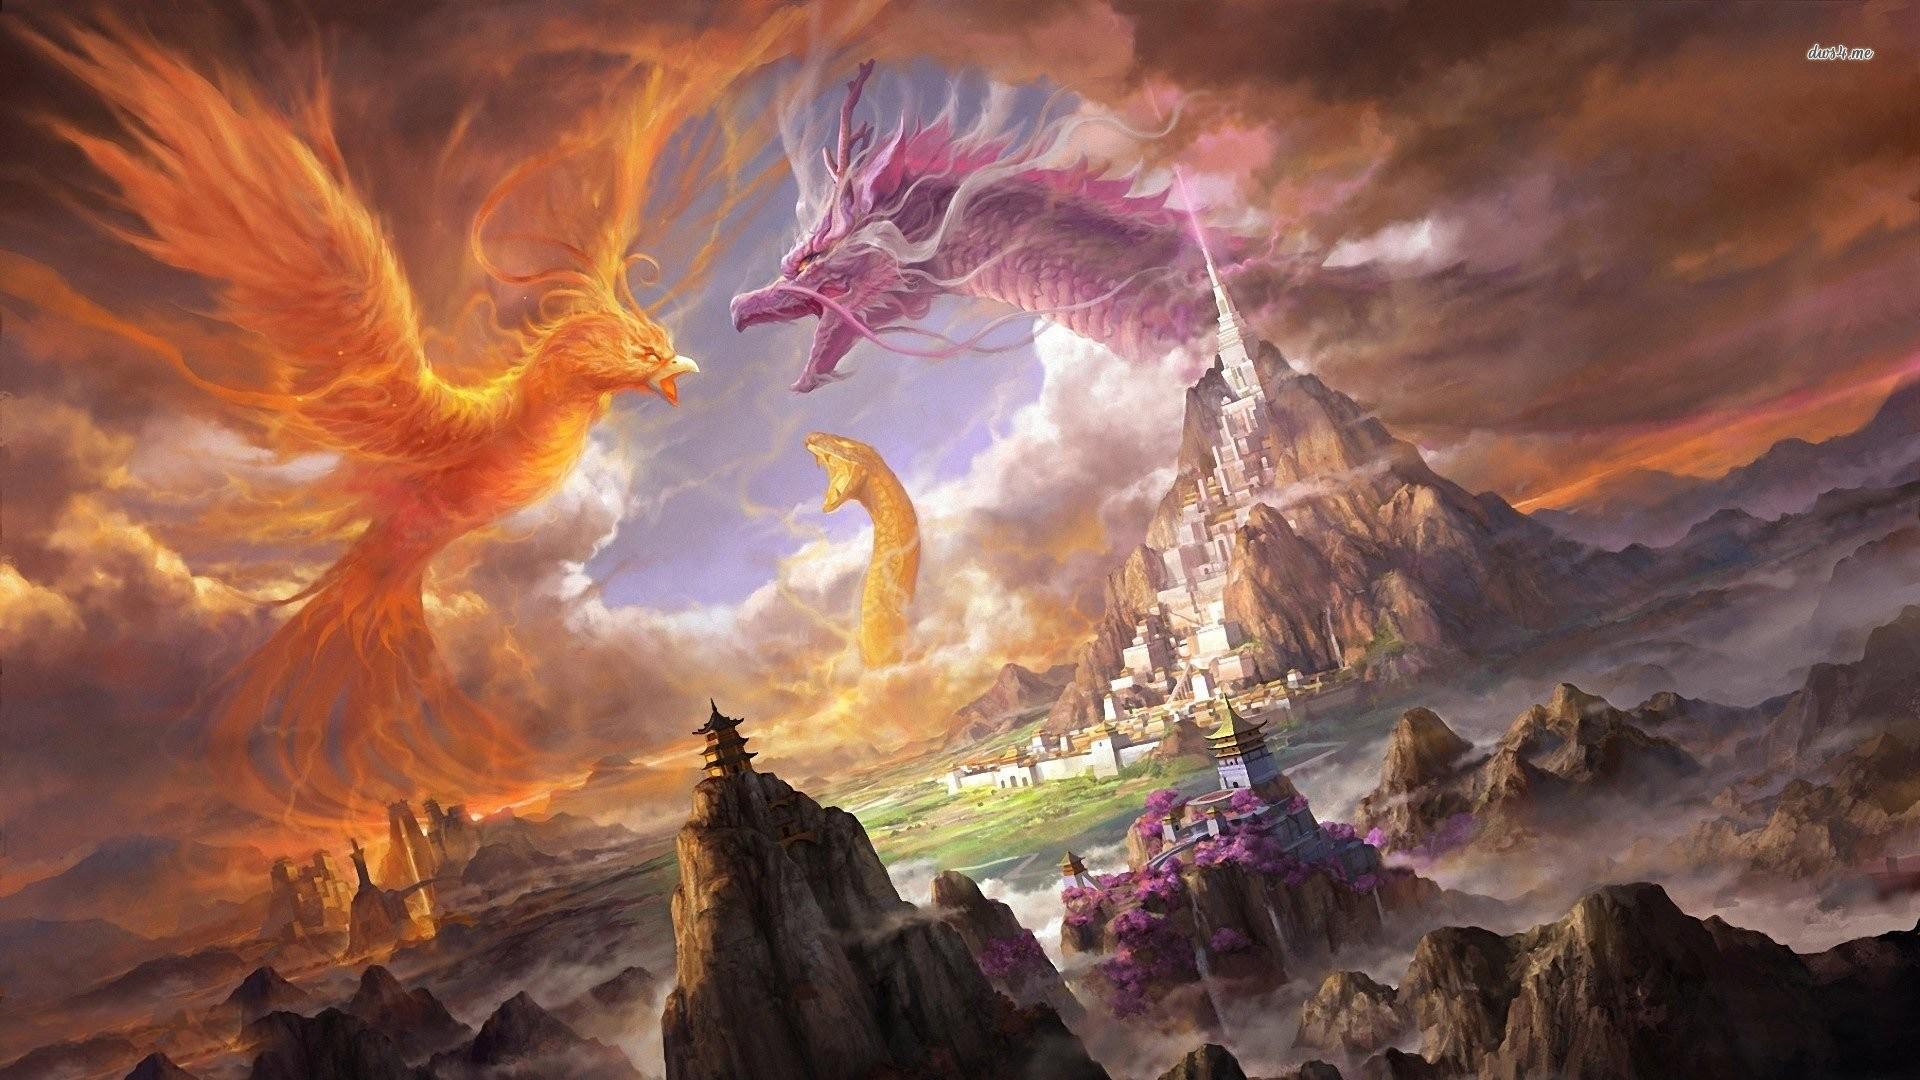 Hd Supreme Wallpaper Iphone X Spyro The Dragon Wallpaper 68 Images